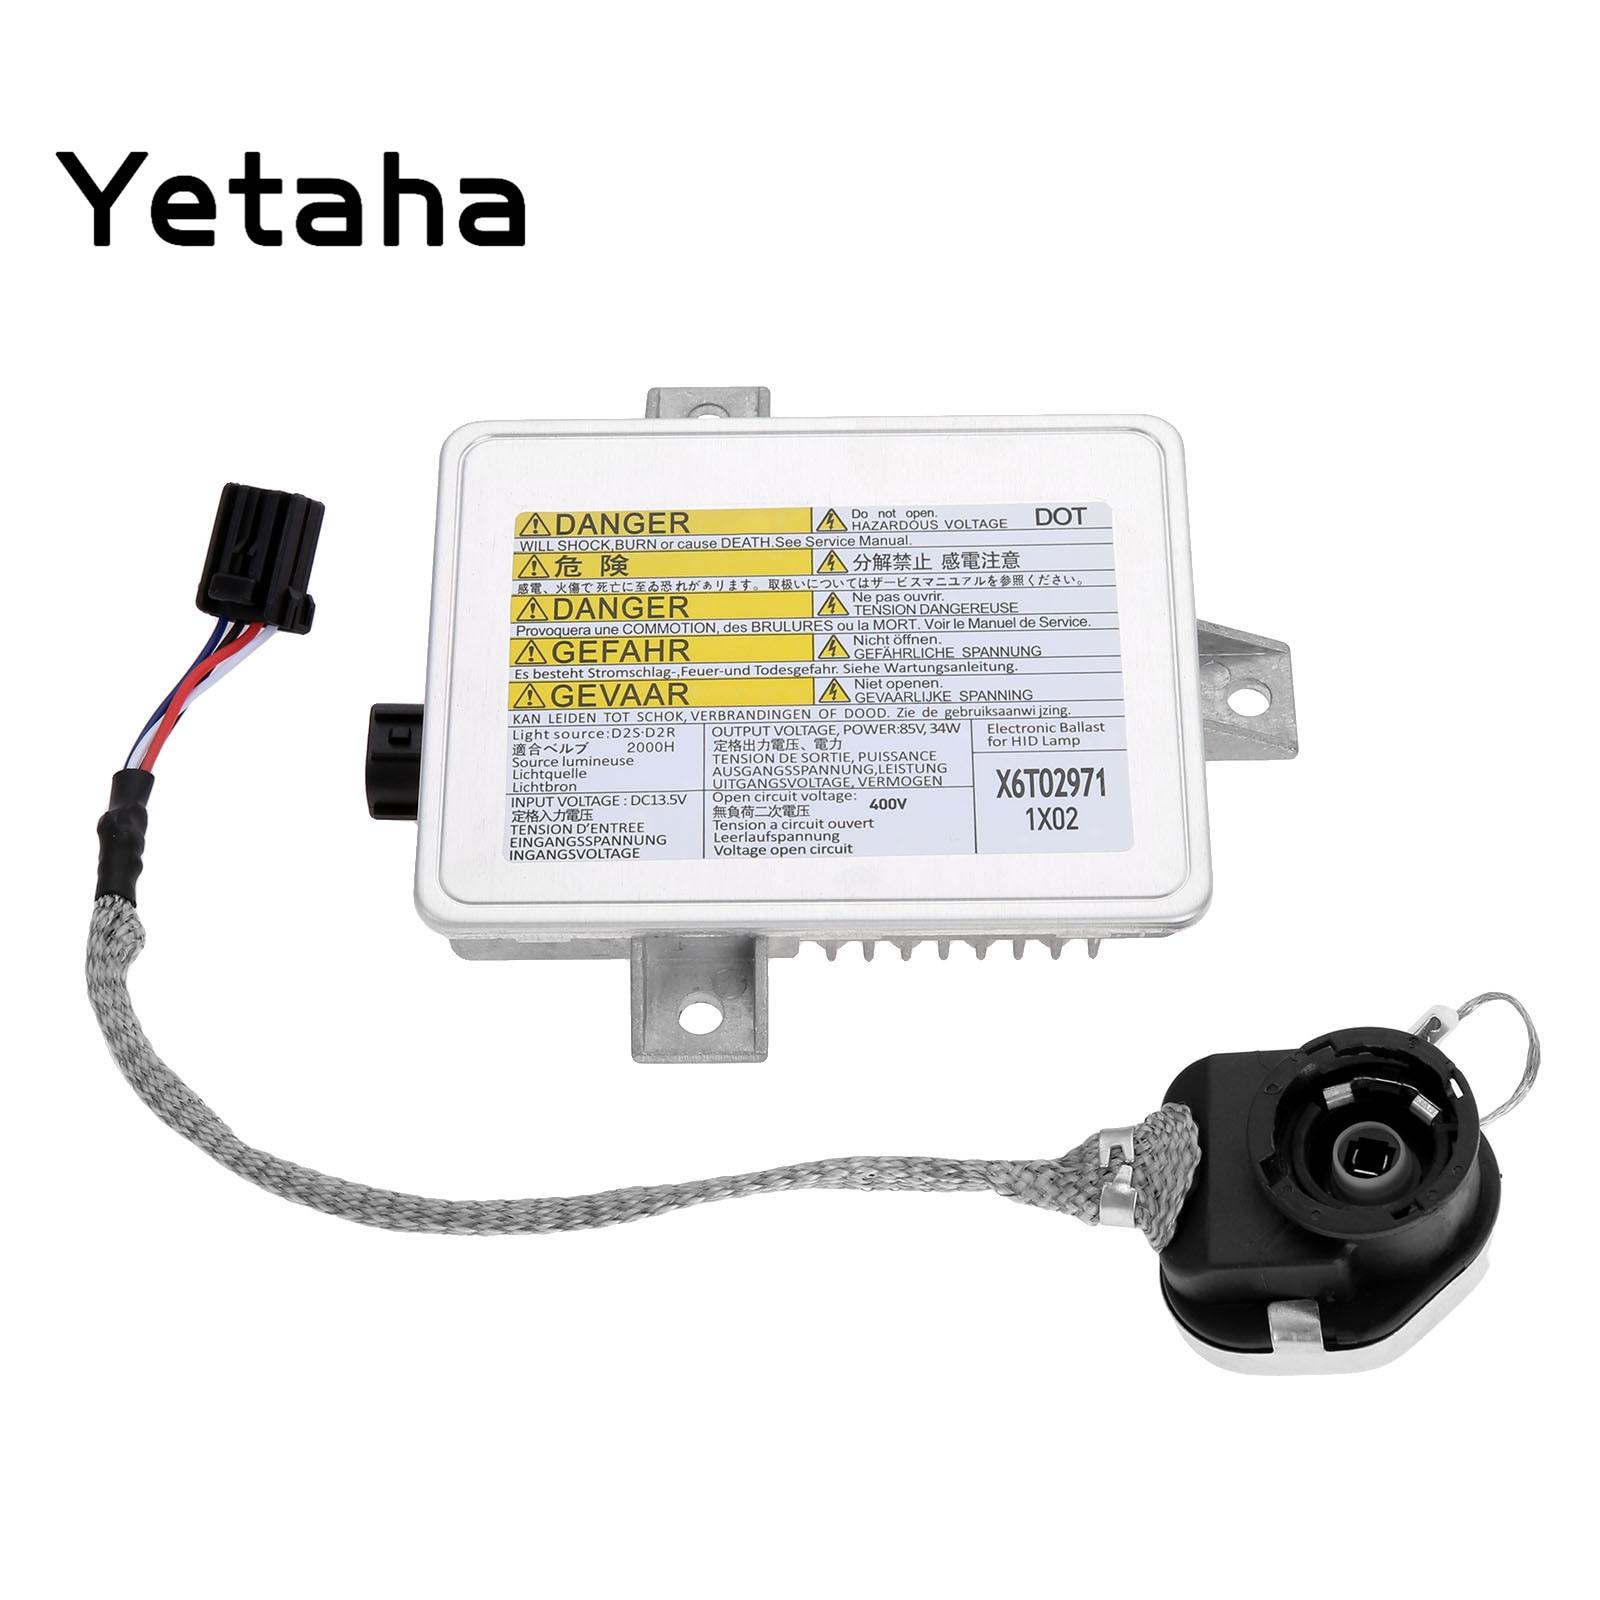 Yetaha D2S D2R Xenon HID Headlight Ballast With Igniter Starter X6T02971 W3T10471 W3T14371 X6T02981 For Acura TSX Honda Mazda 3